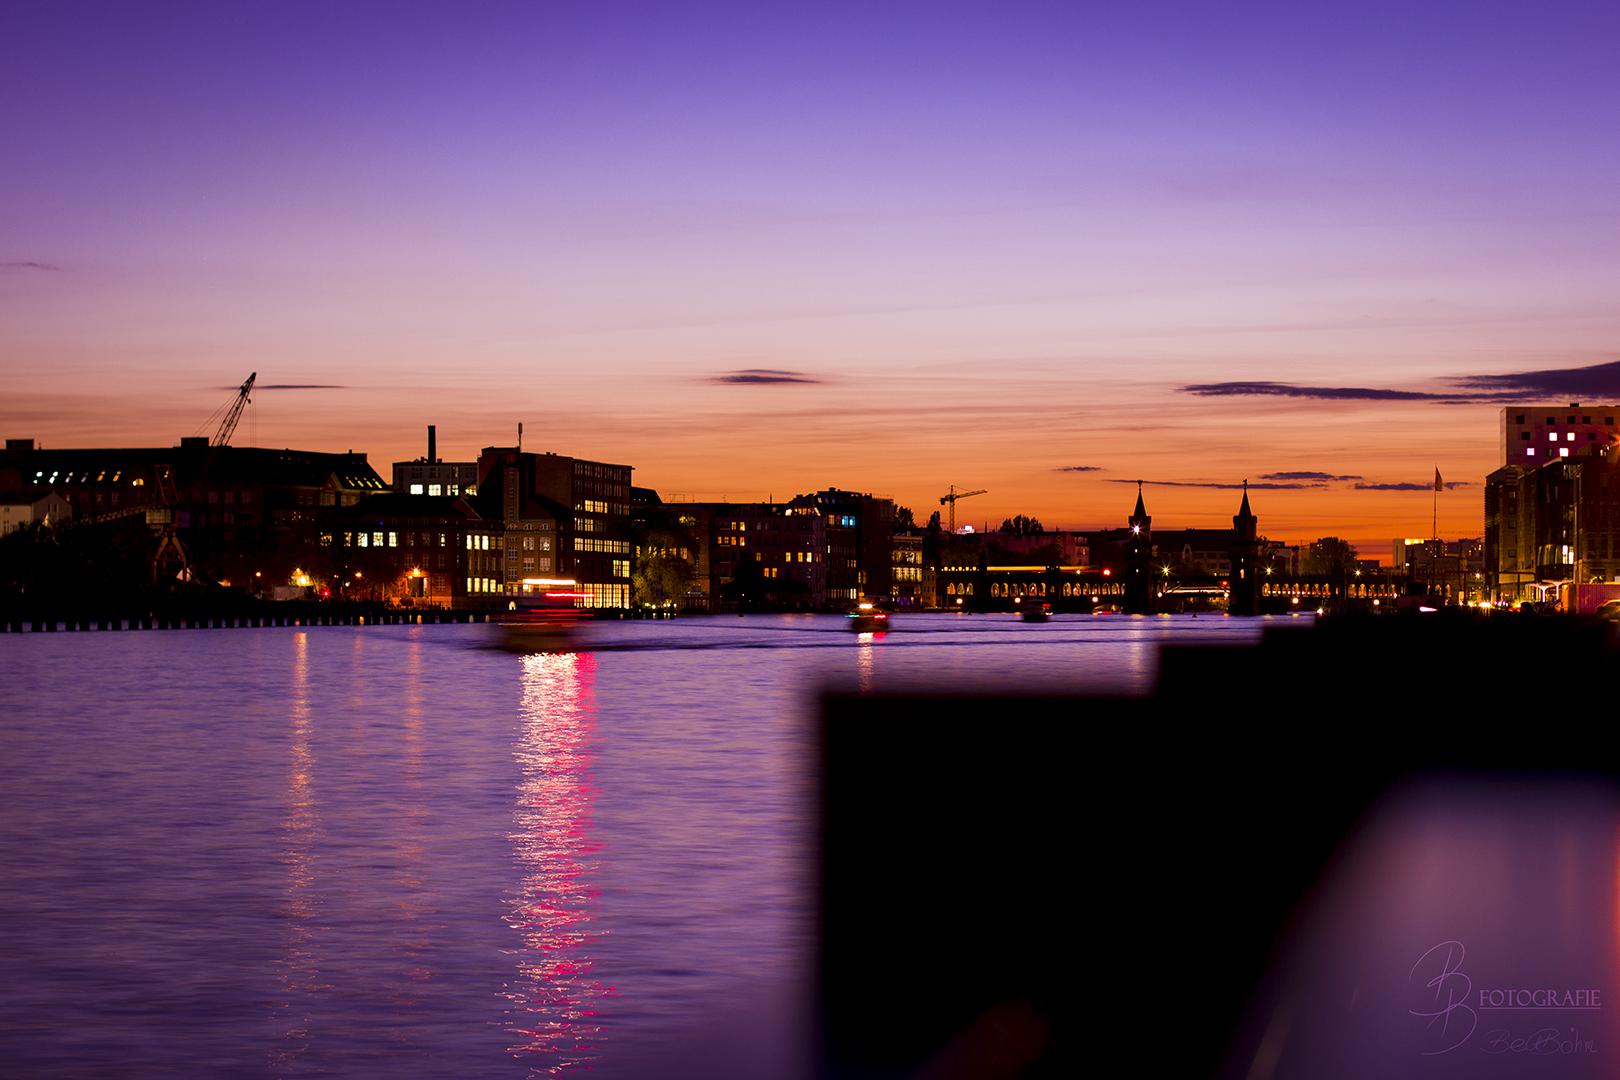 02 Berlin Sonnenuntergang über der Oberbaumbrücke